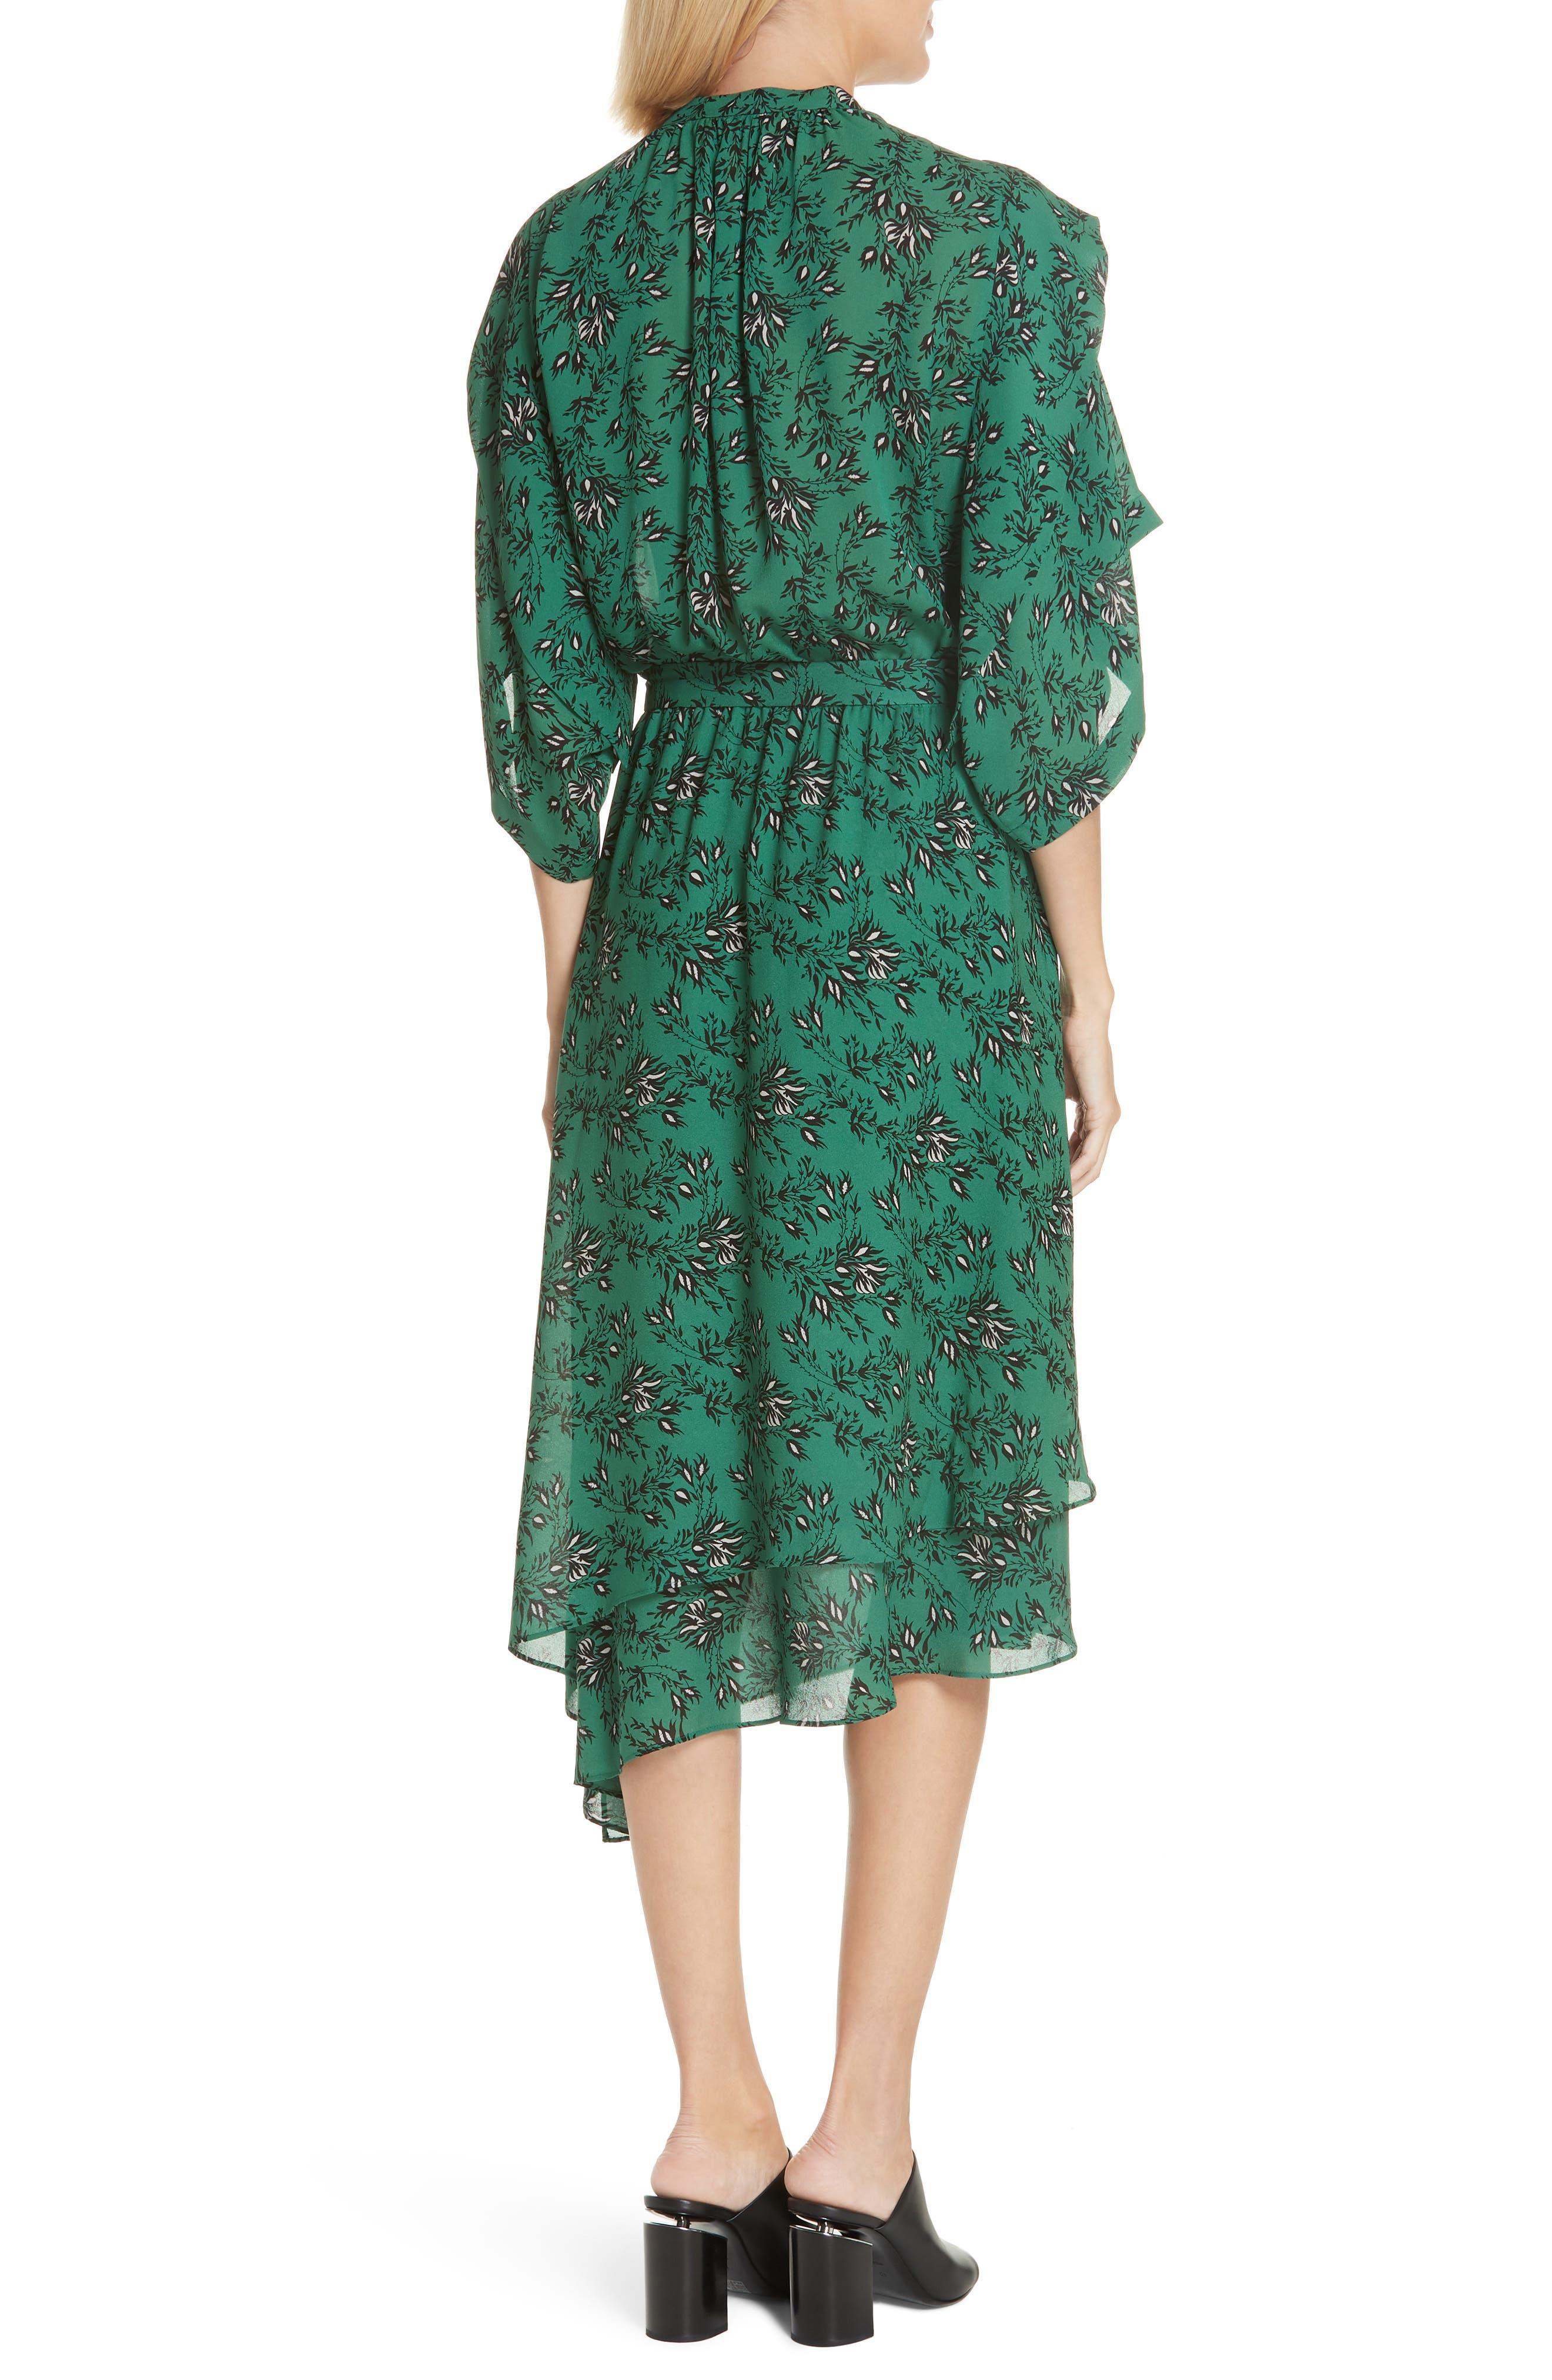 Japanese Floral Midi Dress,                             Alternate thumbnail 2, color,                             EMERALD ORCHID